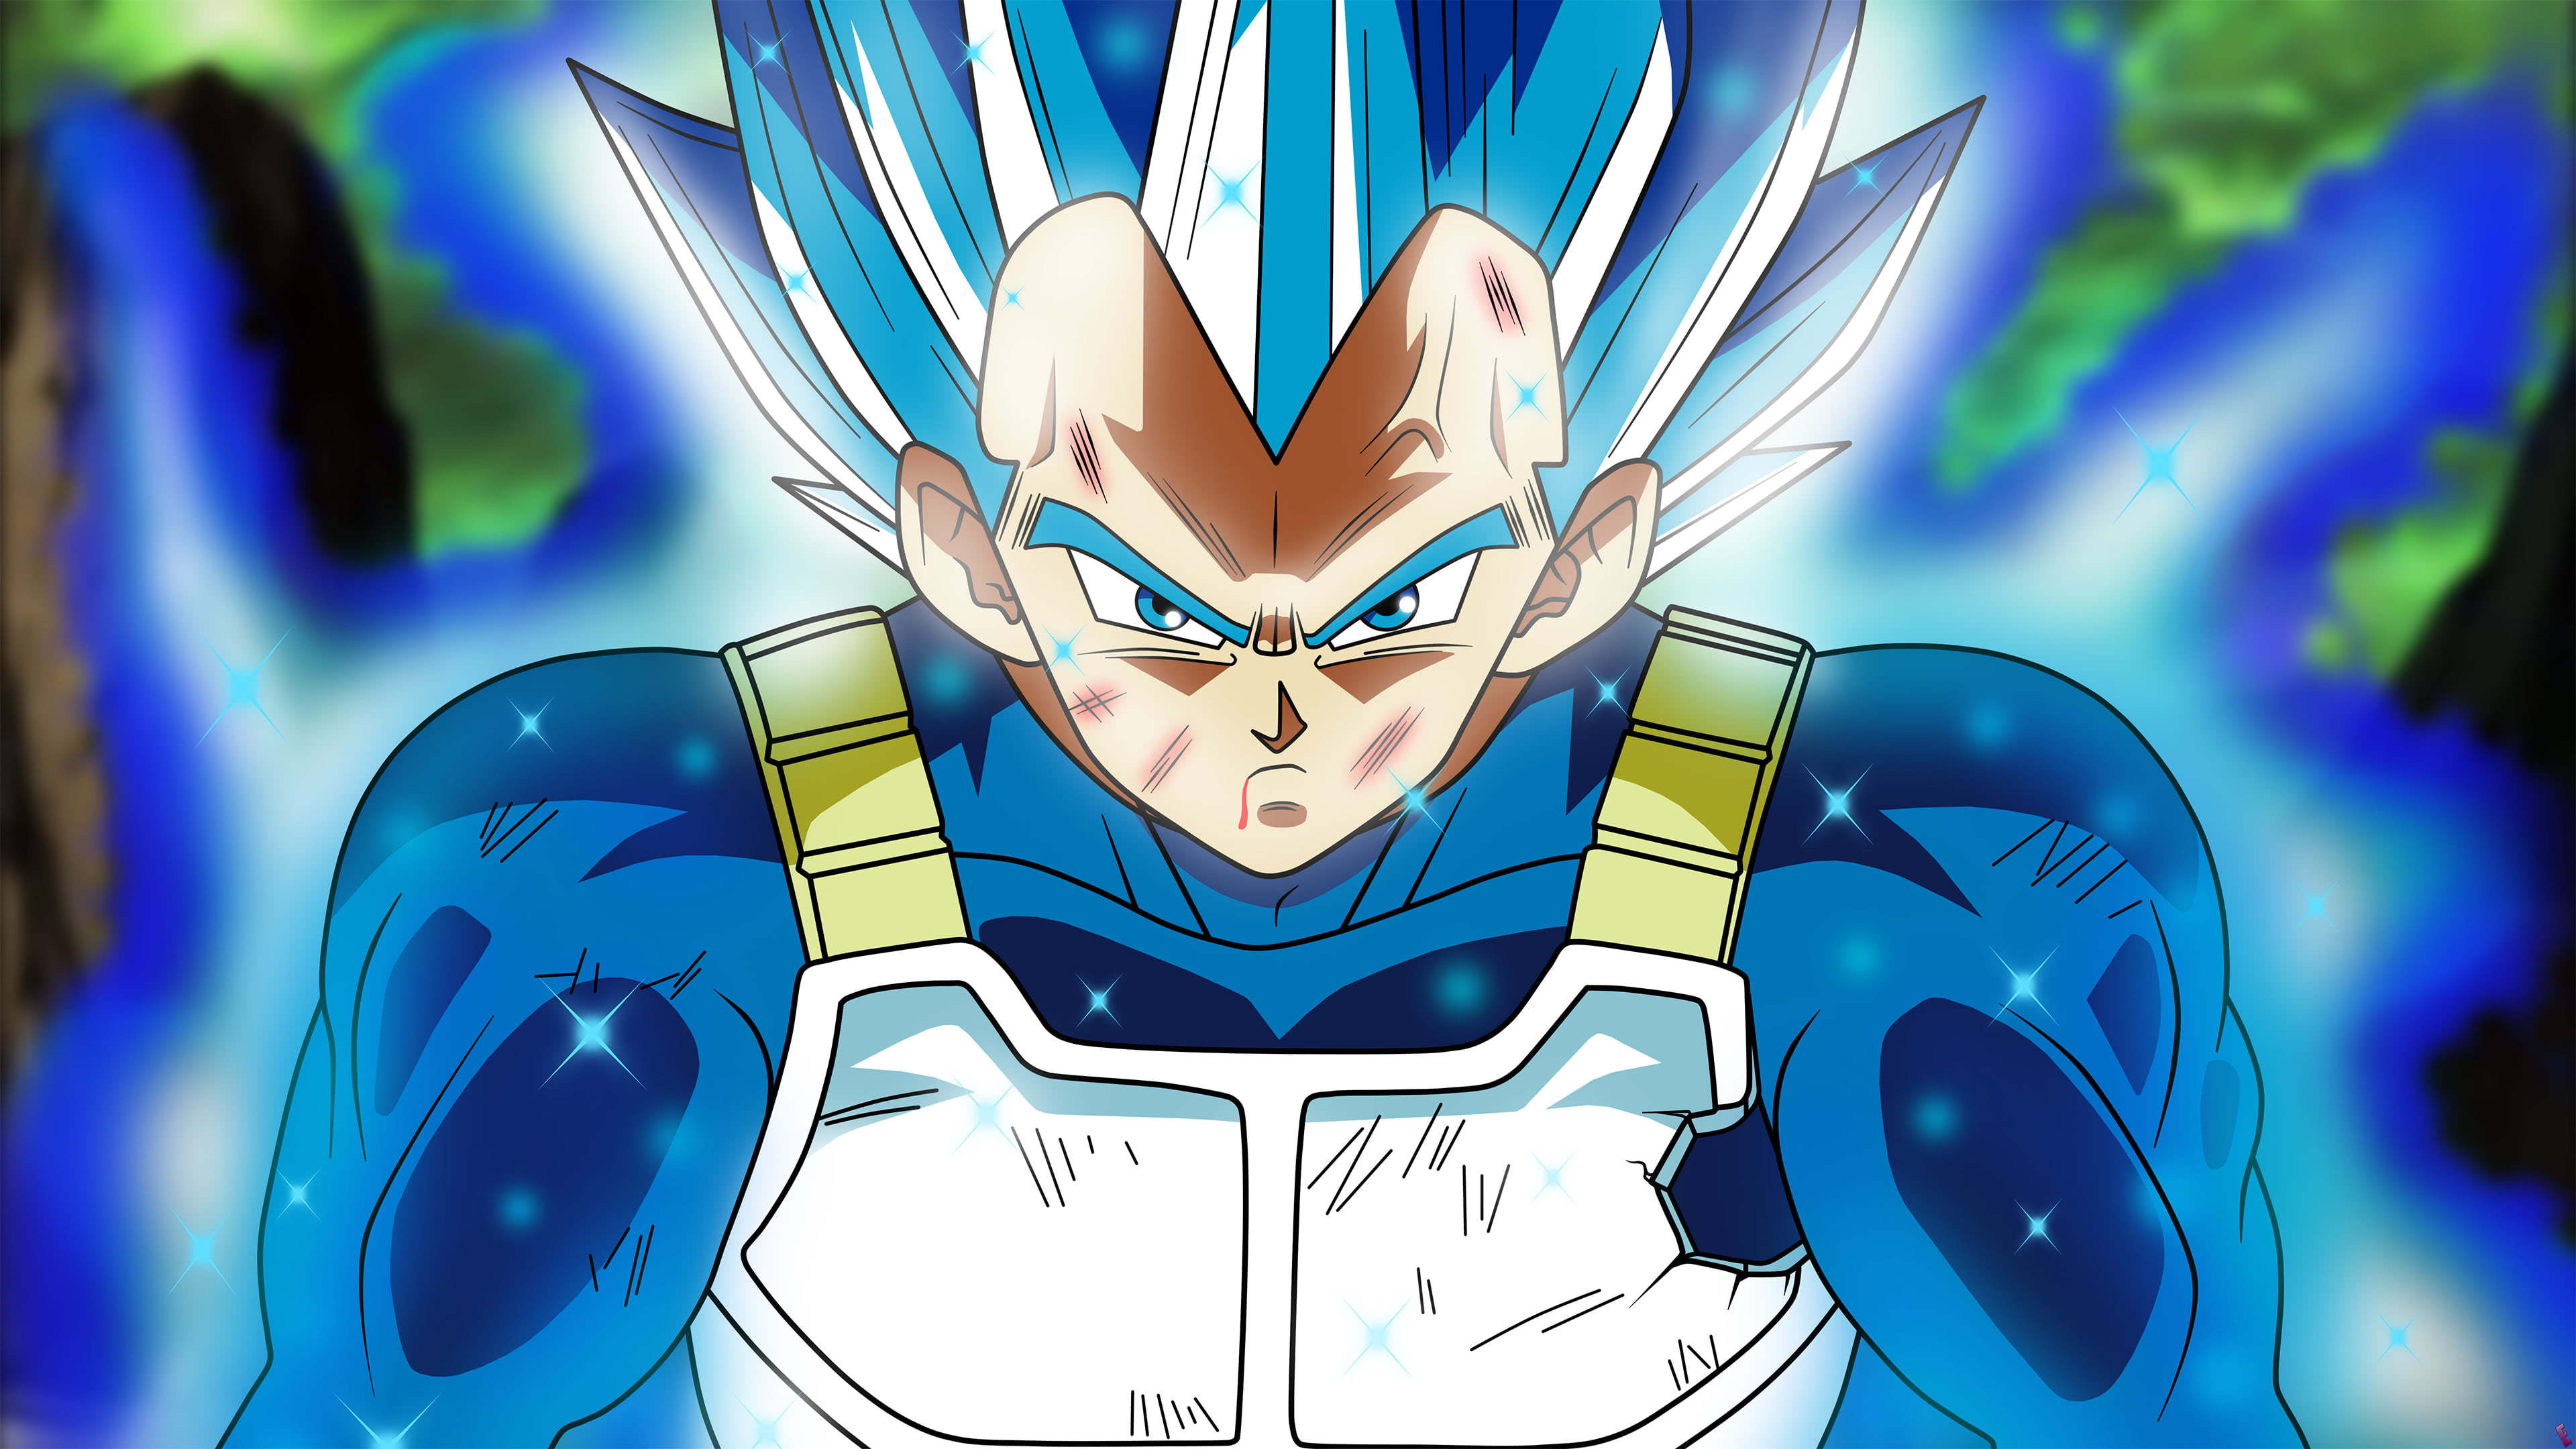 Dragon Ball Perfected Super Saiyan Blue Vegeta Uhd Vegeta Super Saiyan Blue Evolution 3840x2160 Download Hd Wallpaper Wallpapertip